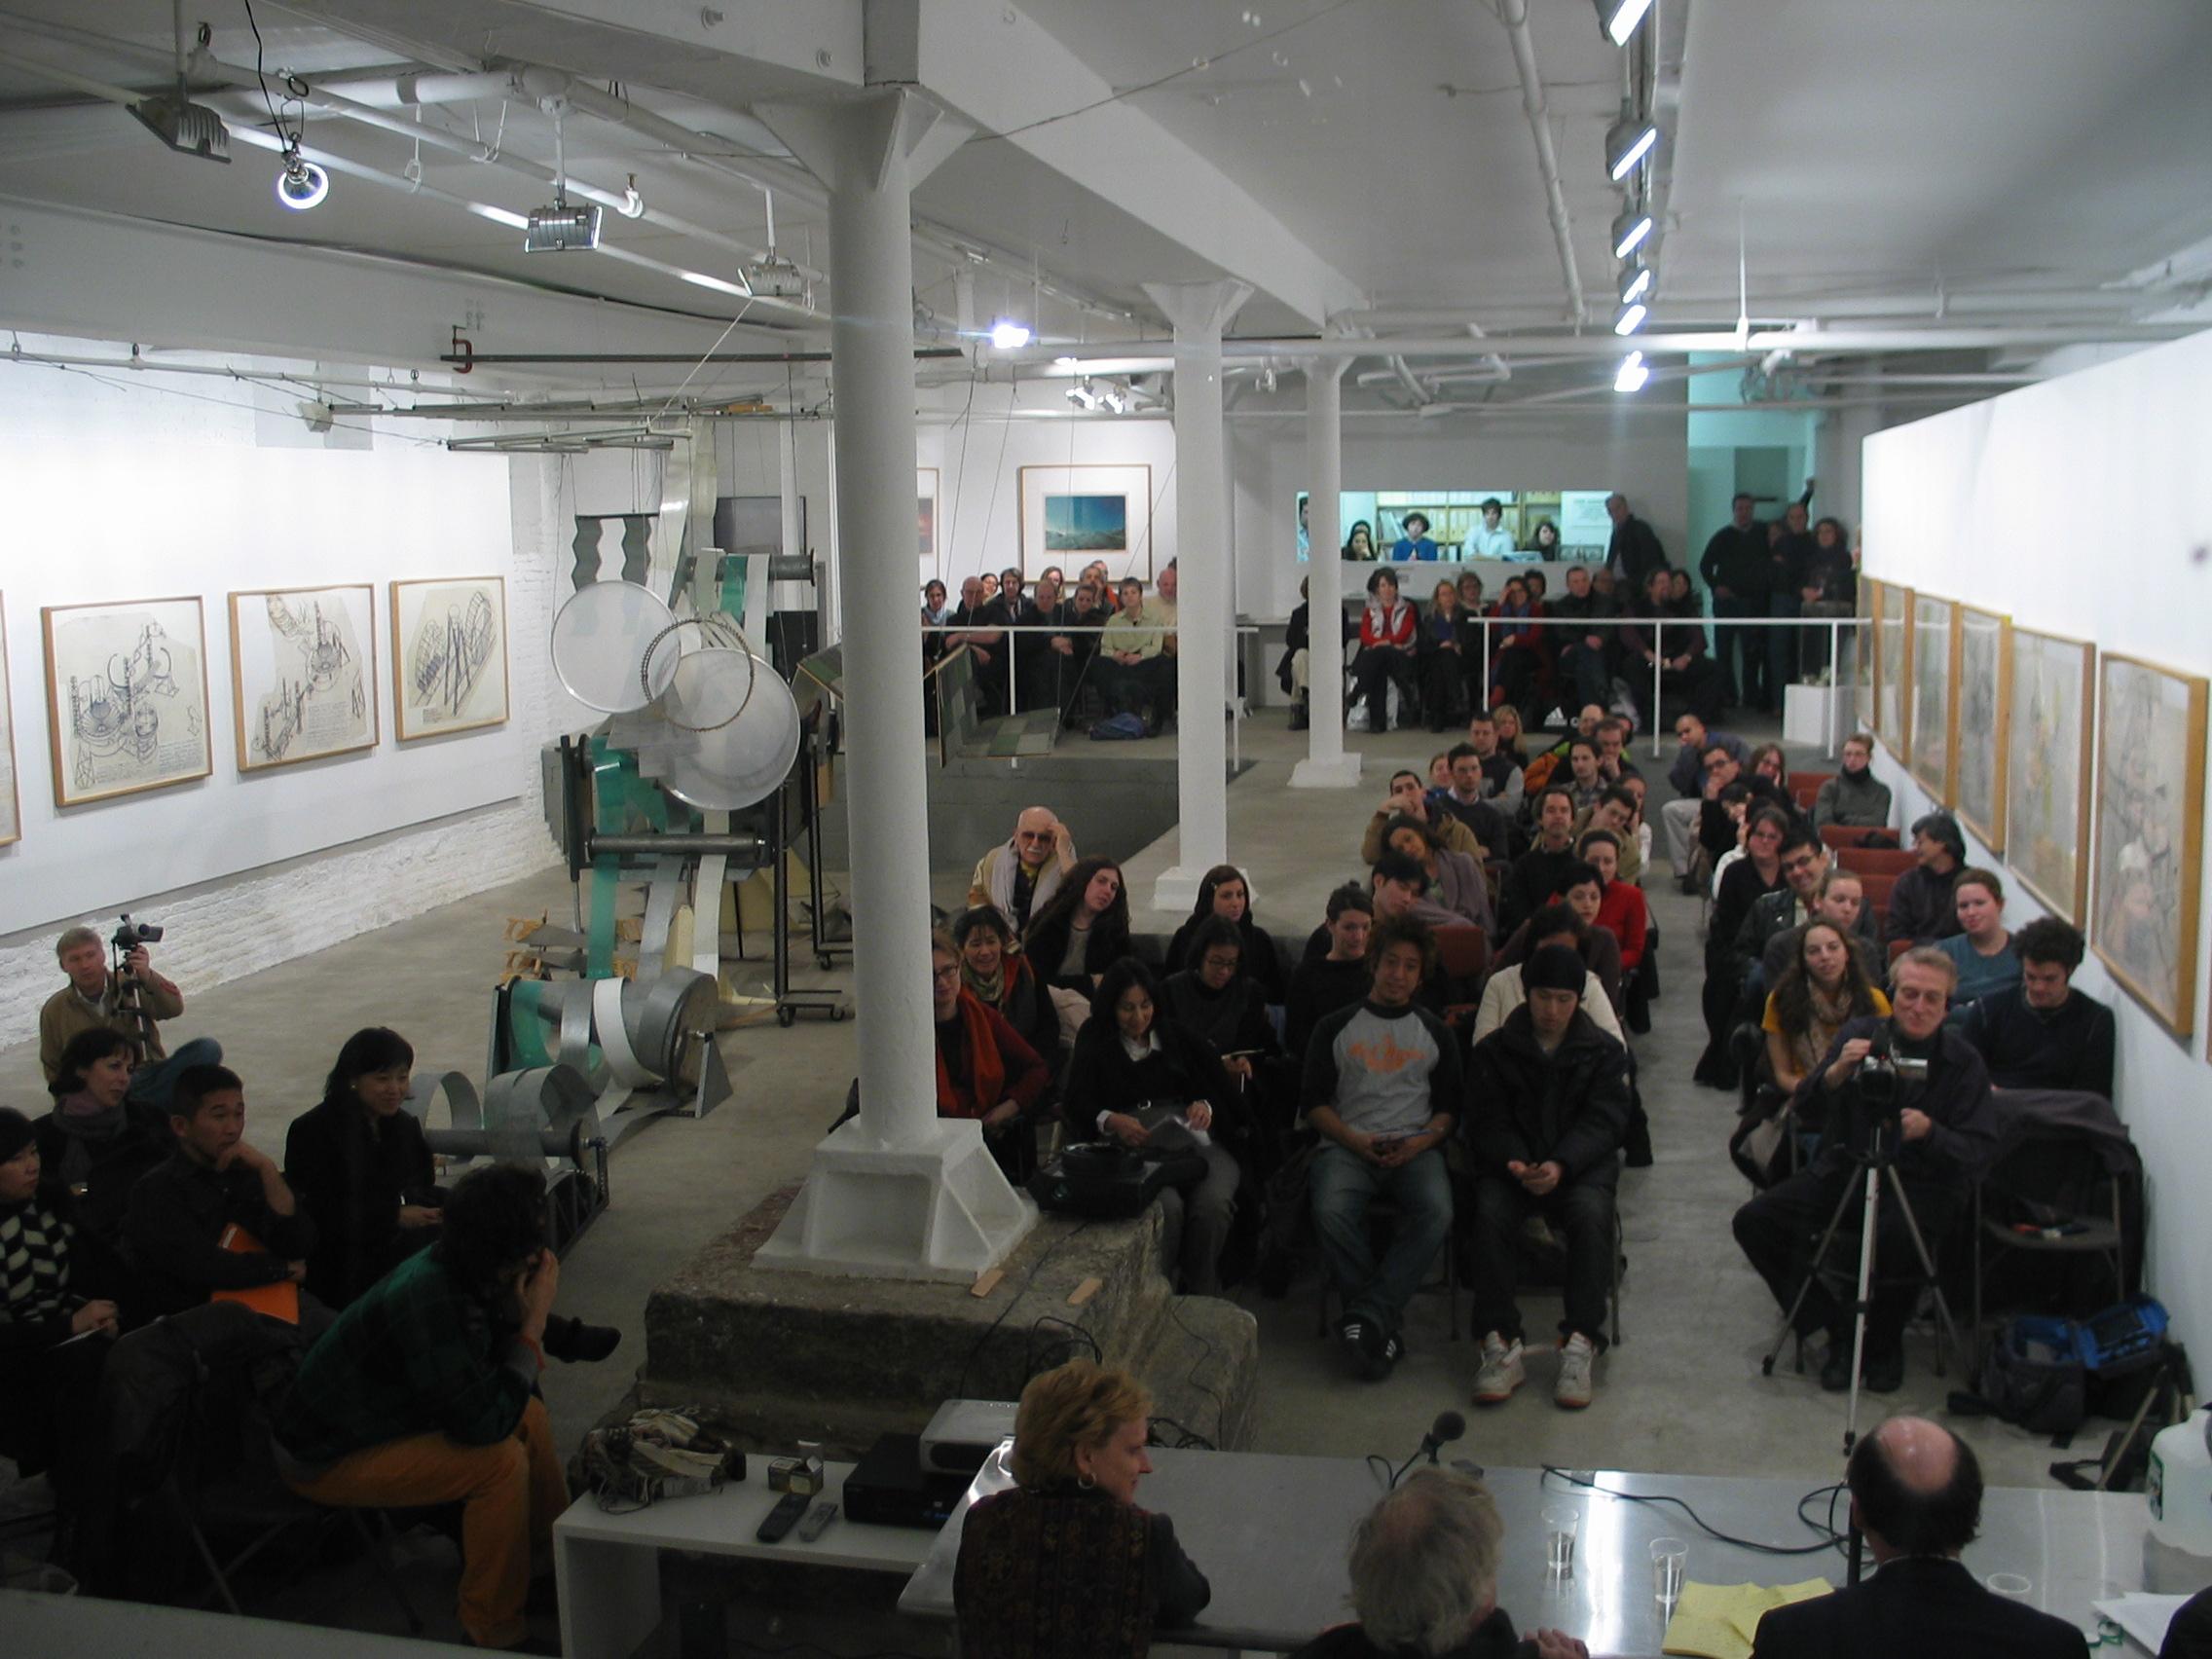 Dennis Oppenheim - Opening at WhiteBox_1259